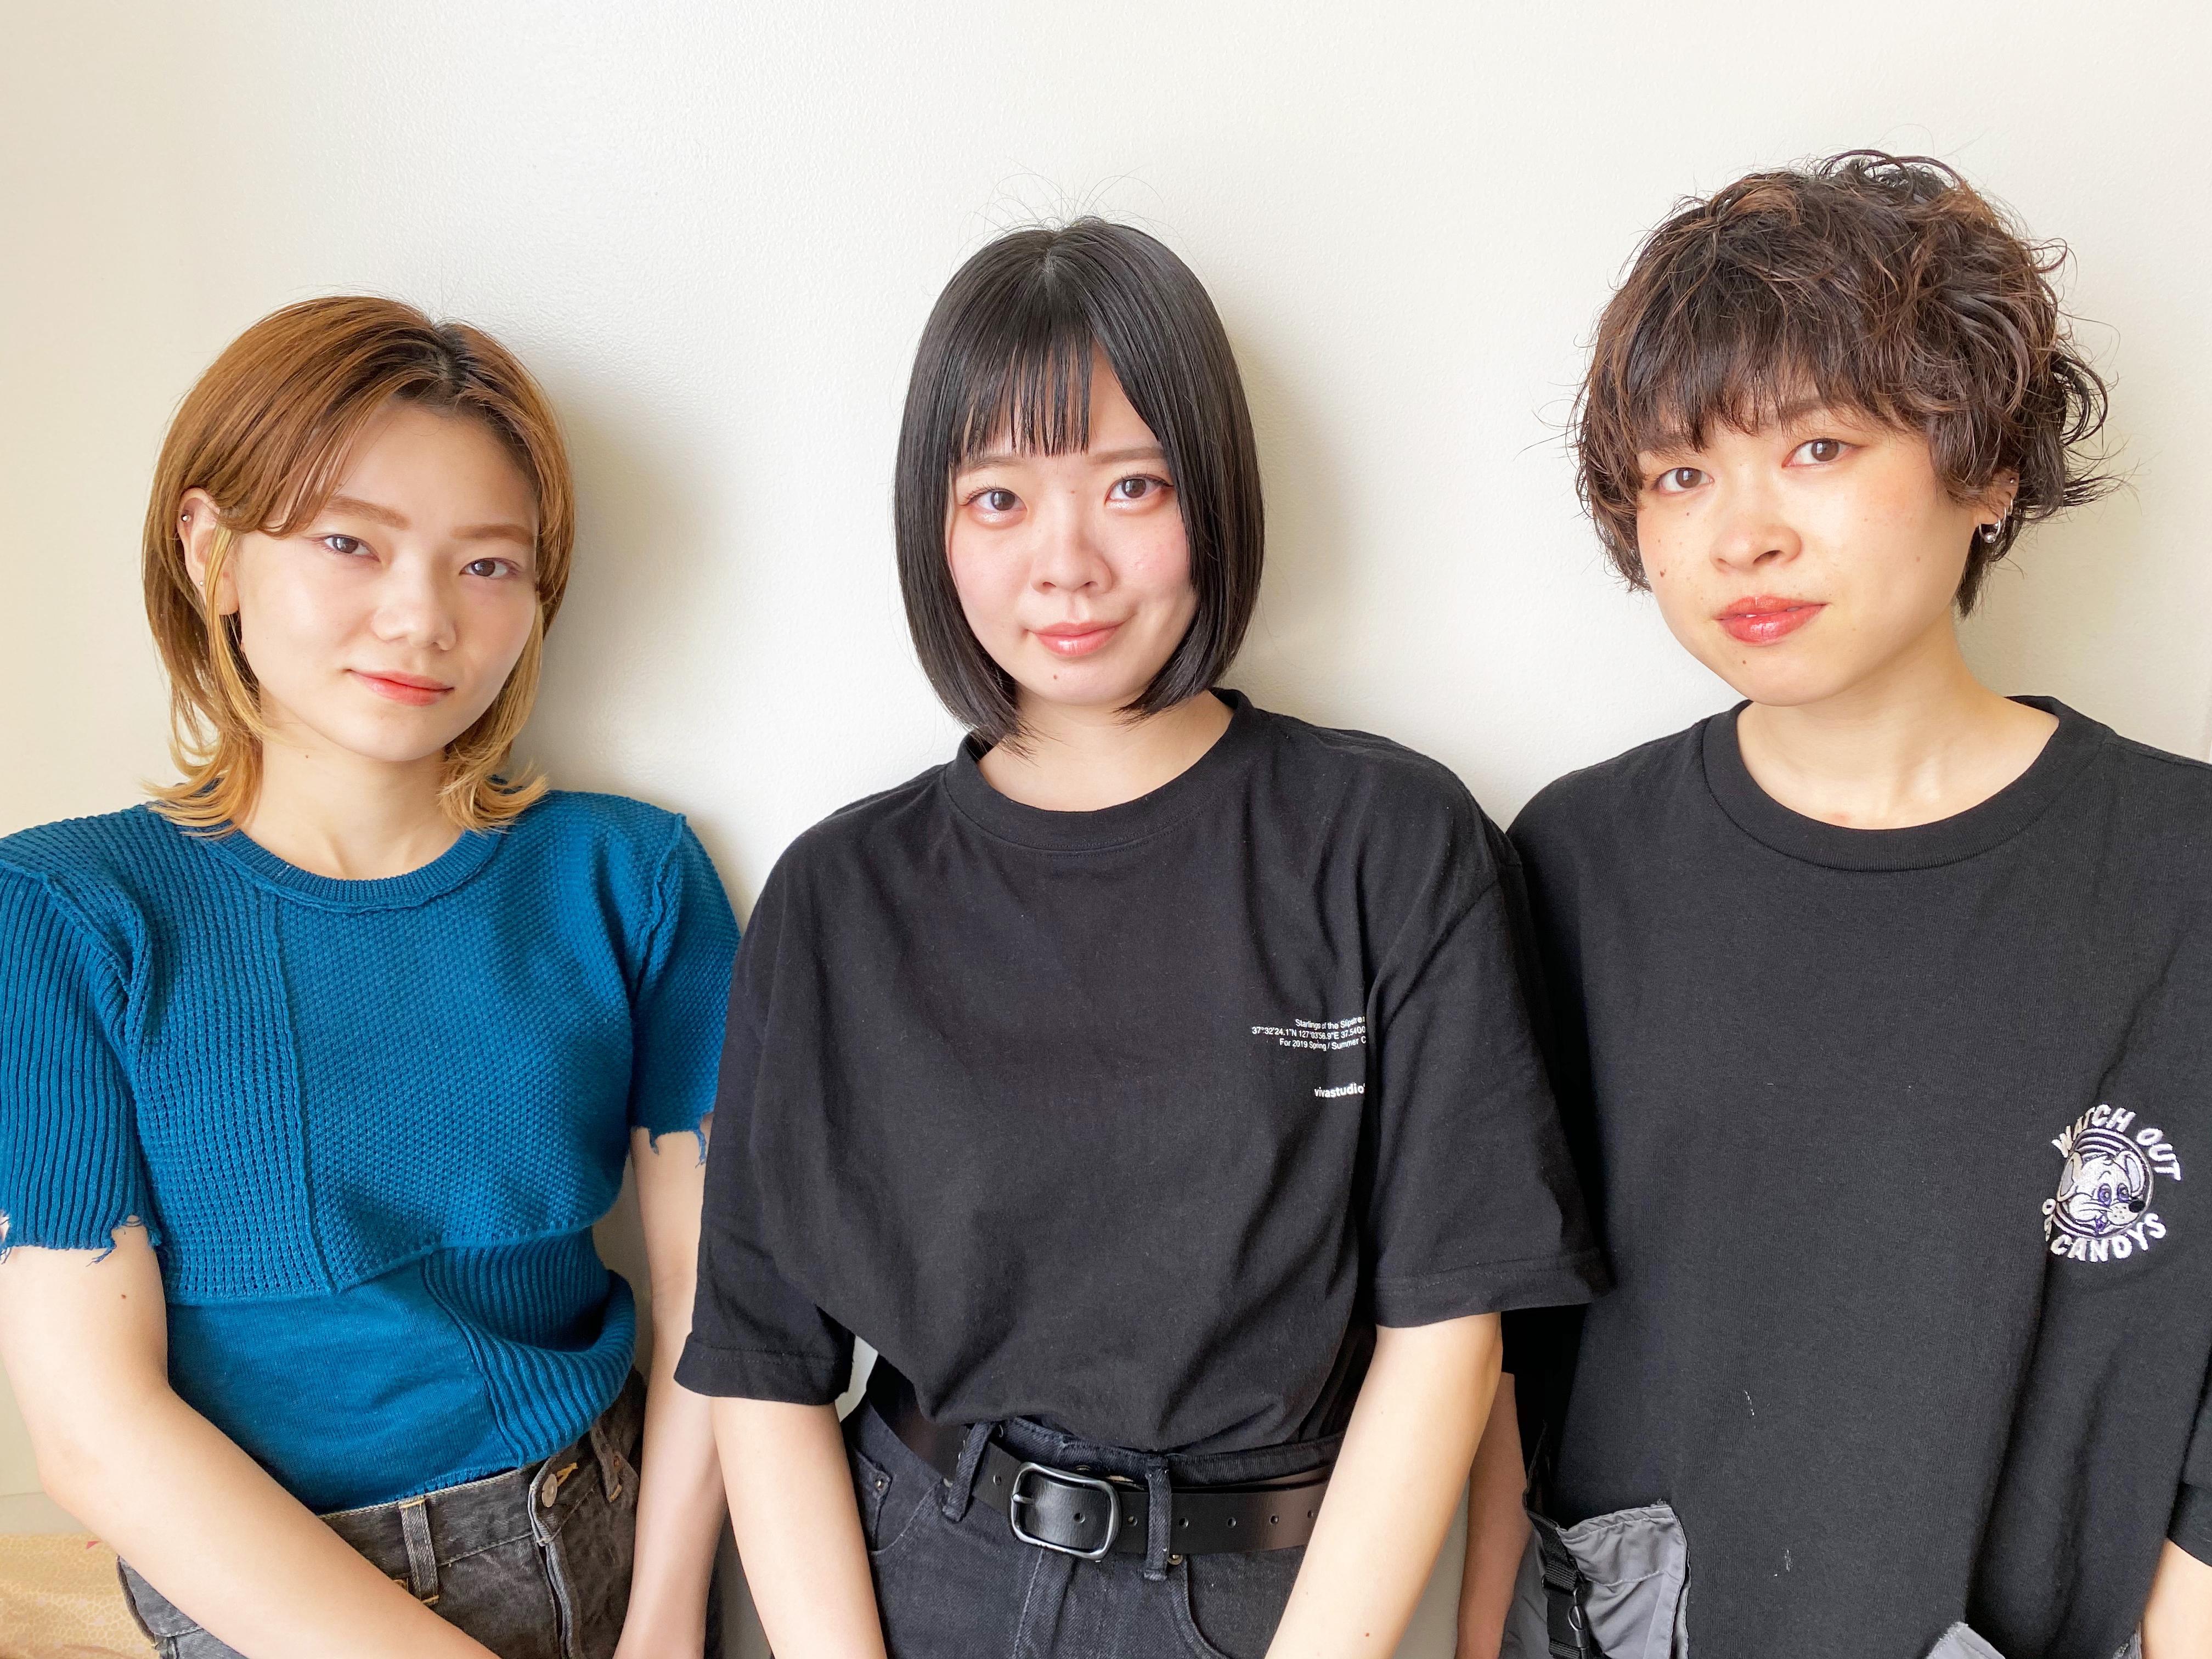 https://www.j-wave.co.jp/blog/spark/images/0907_SHISHAMO.jpg